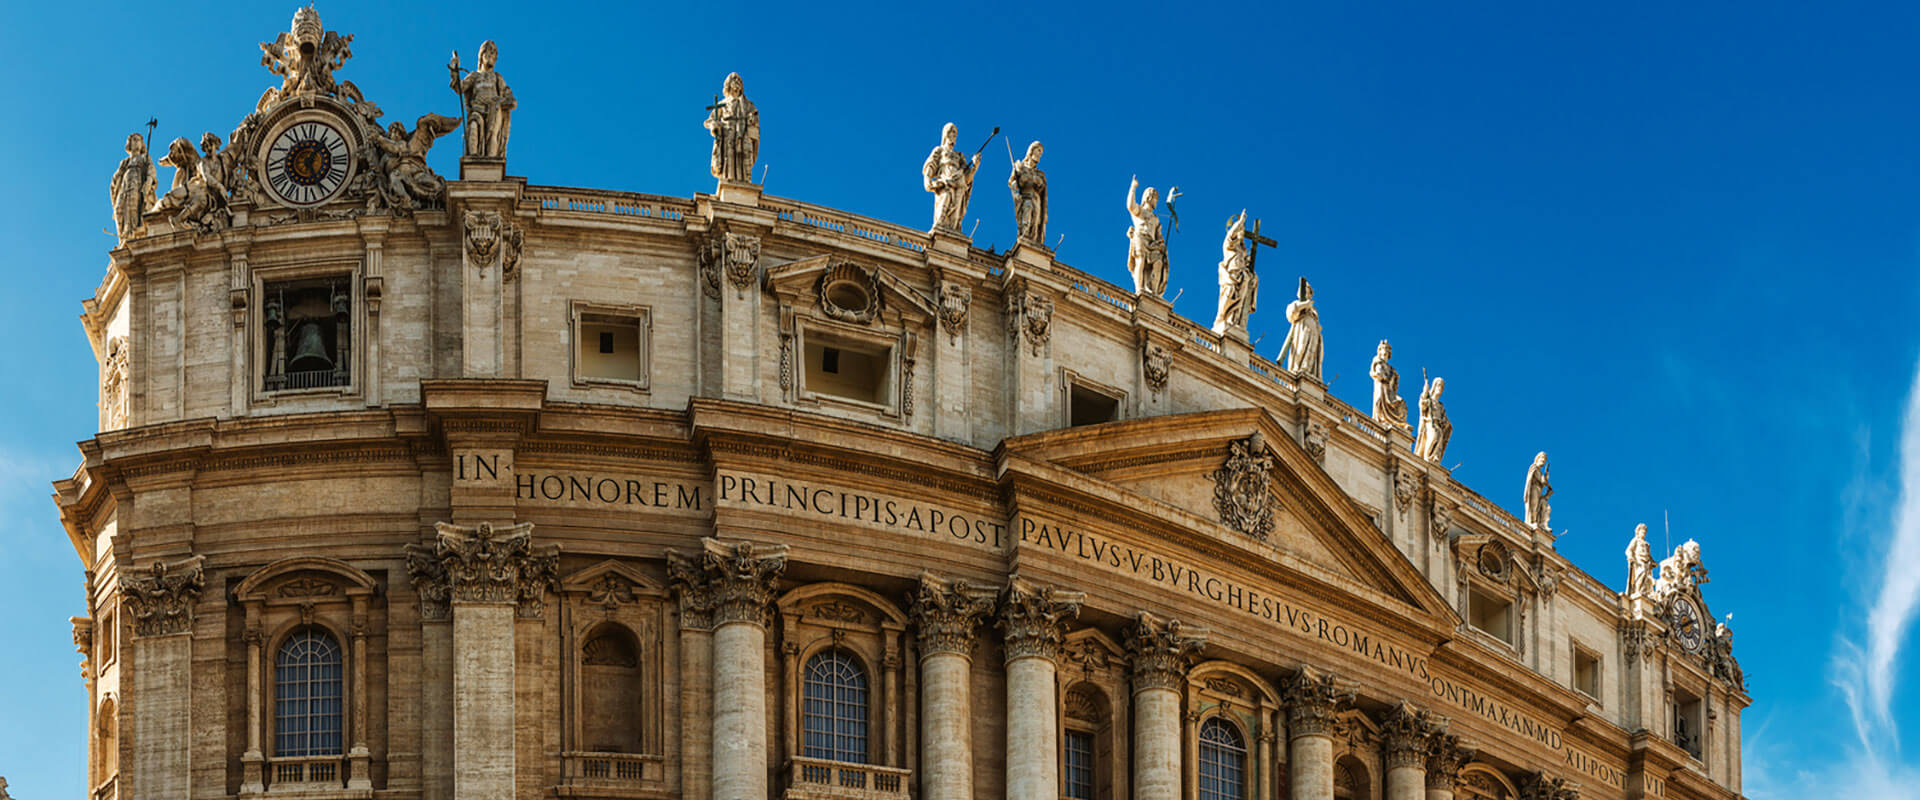 Vatican Museums, Sistine Chapel – Private Tour